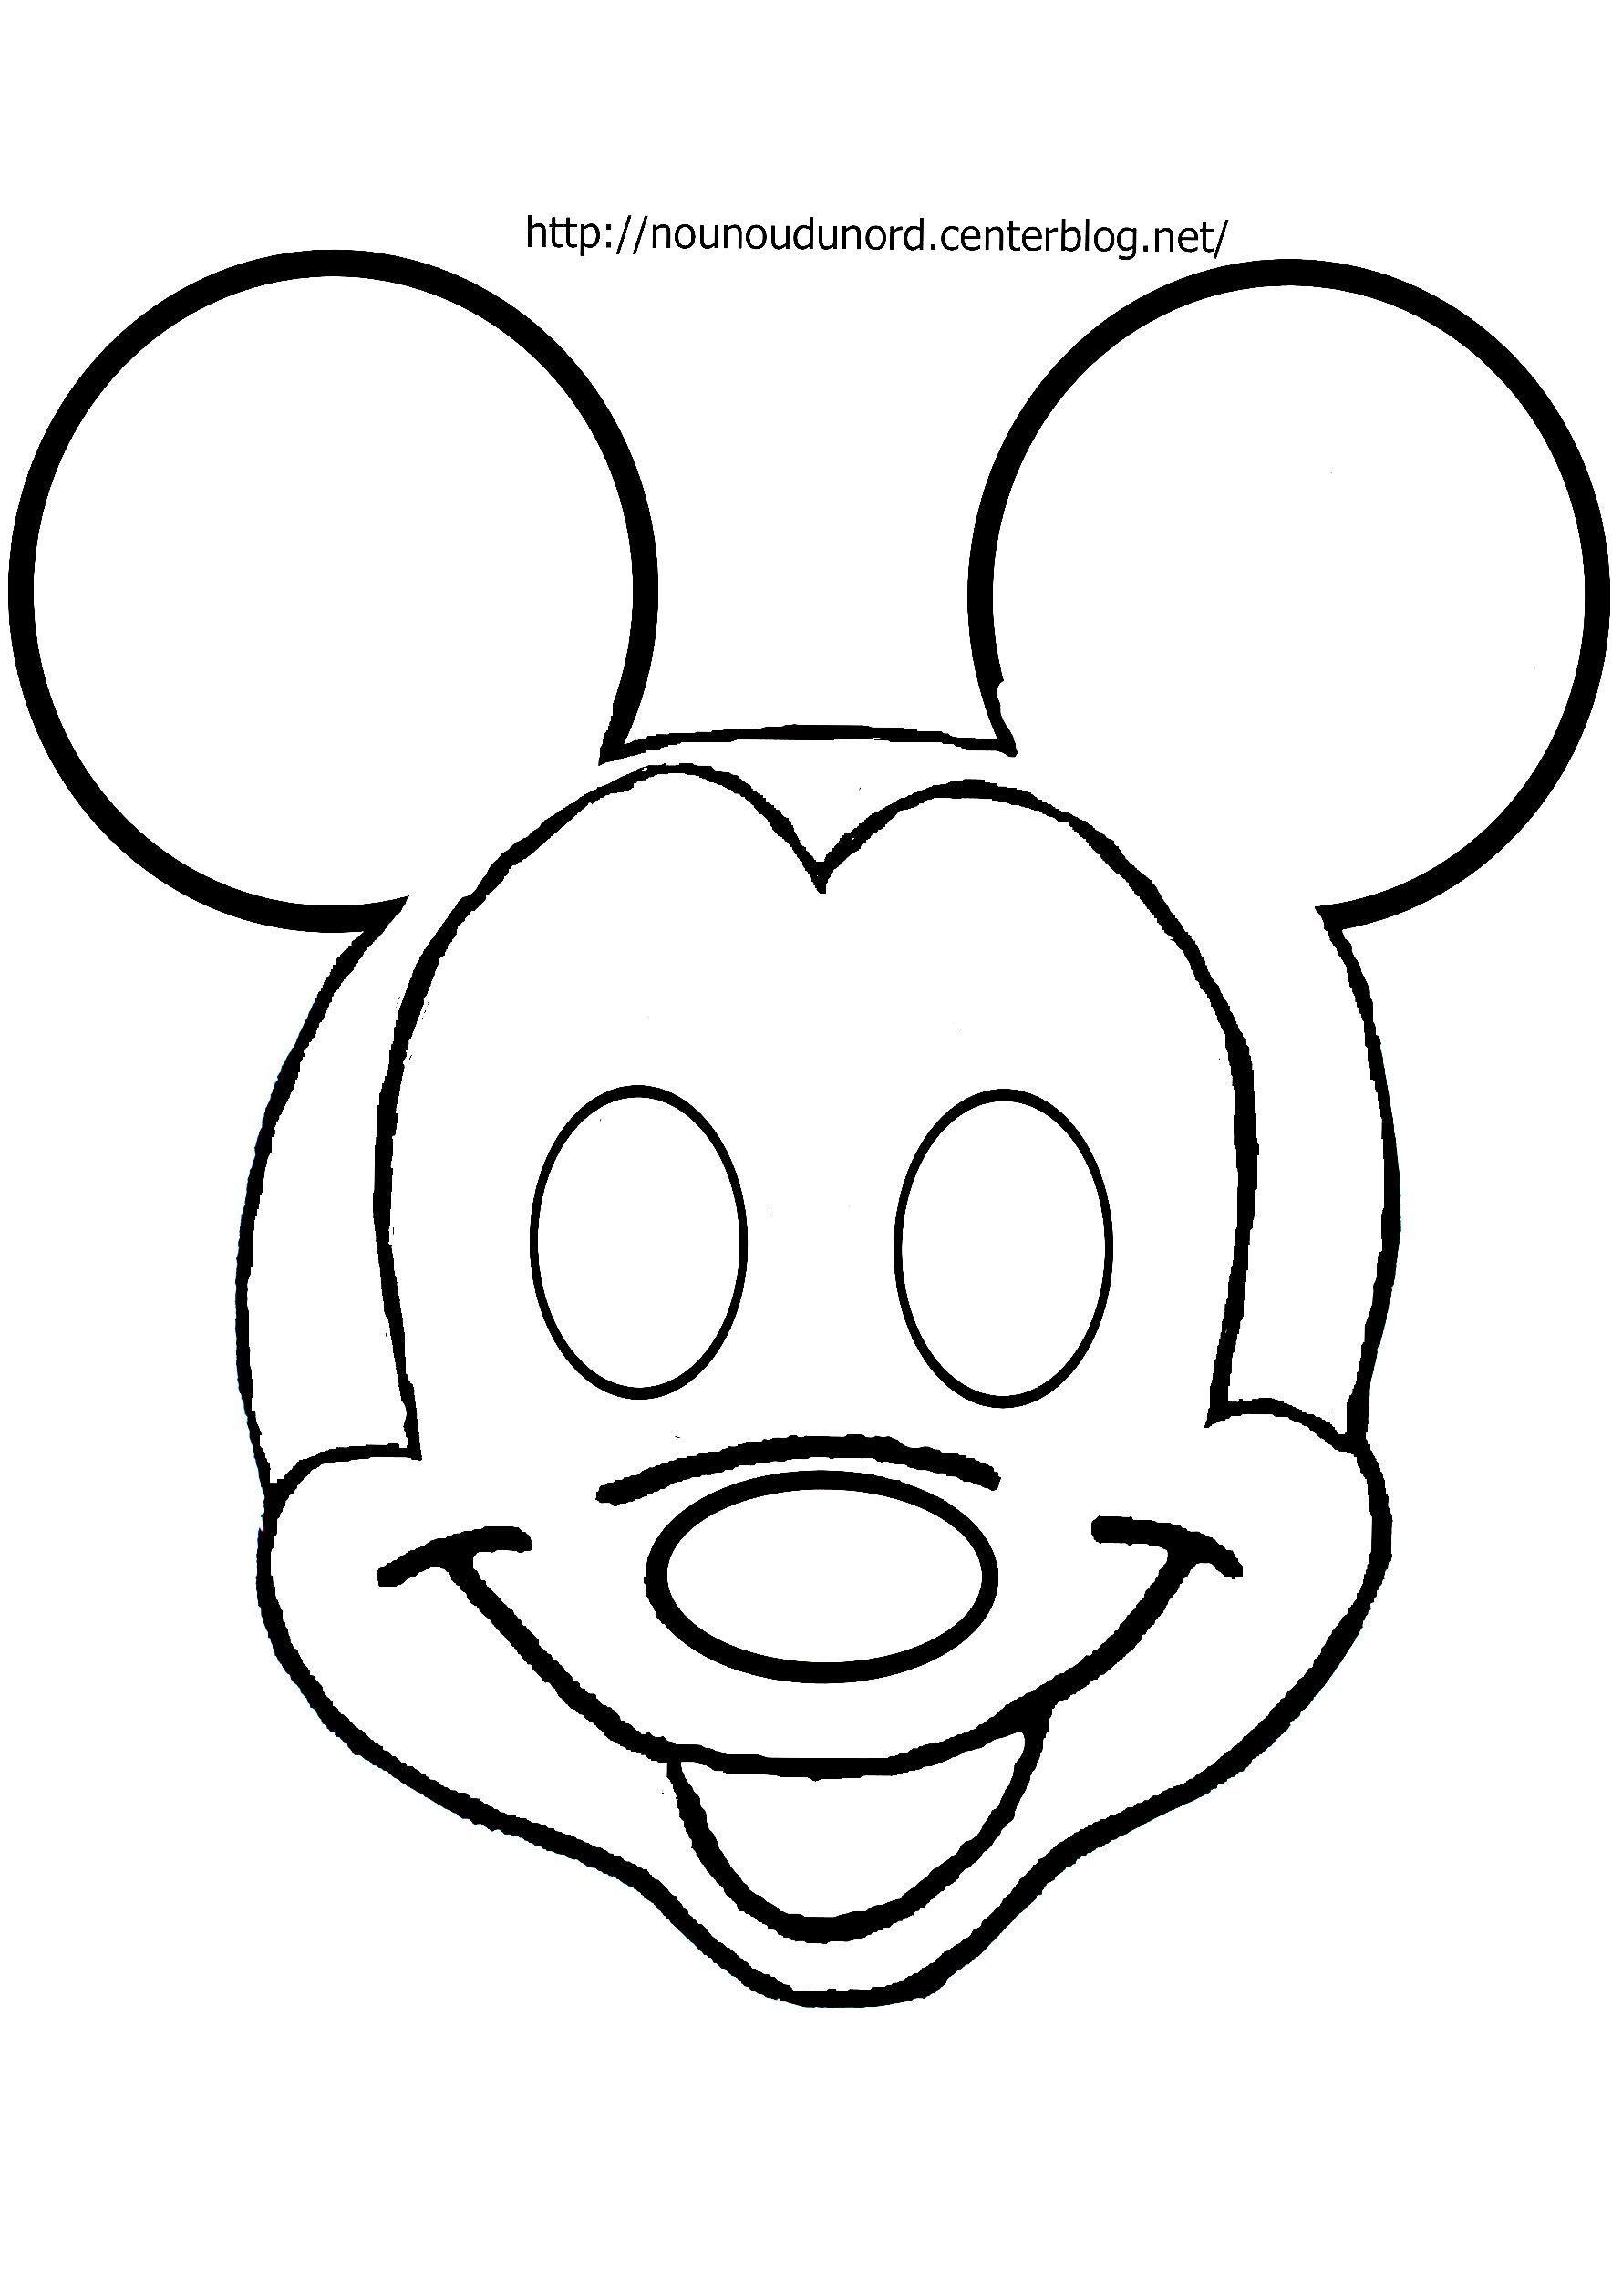 Masque Mickey À Imprimer concernant Modele Masque De Carnaval A Imprimer